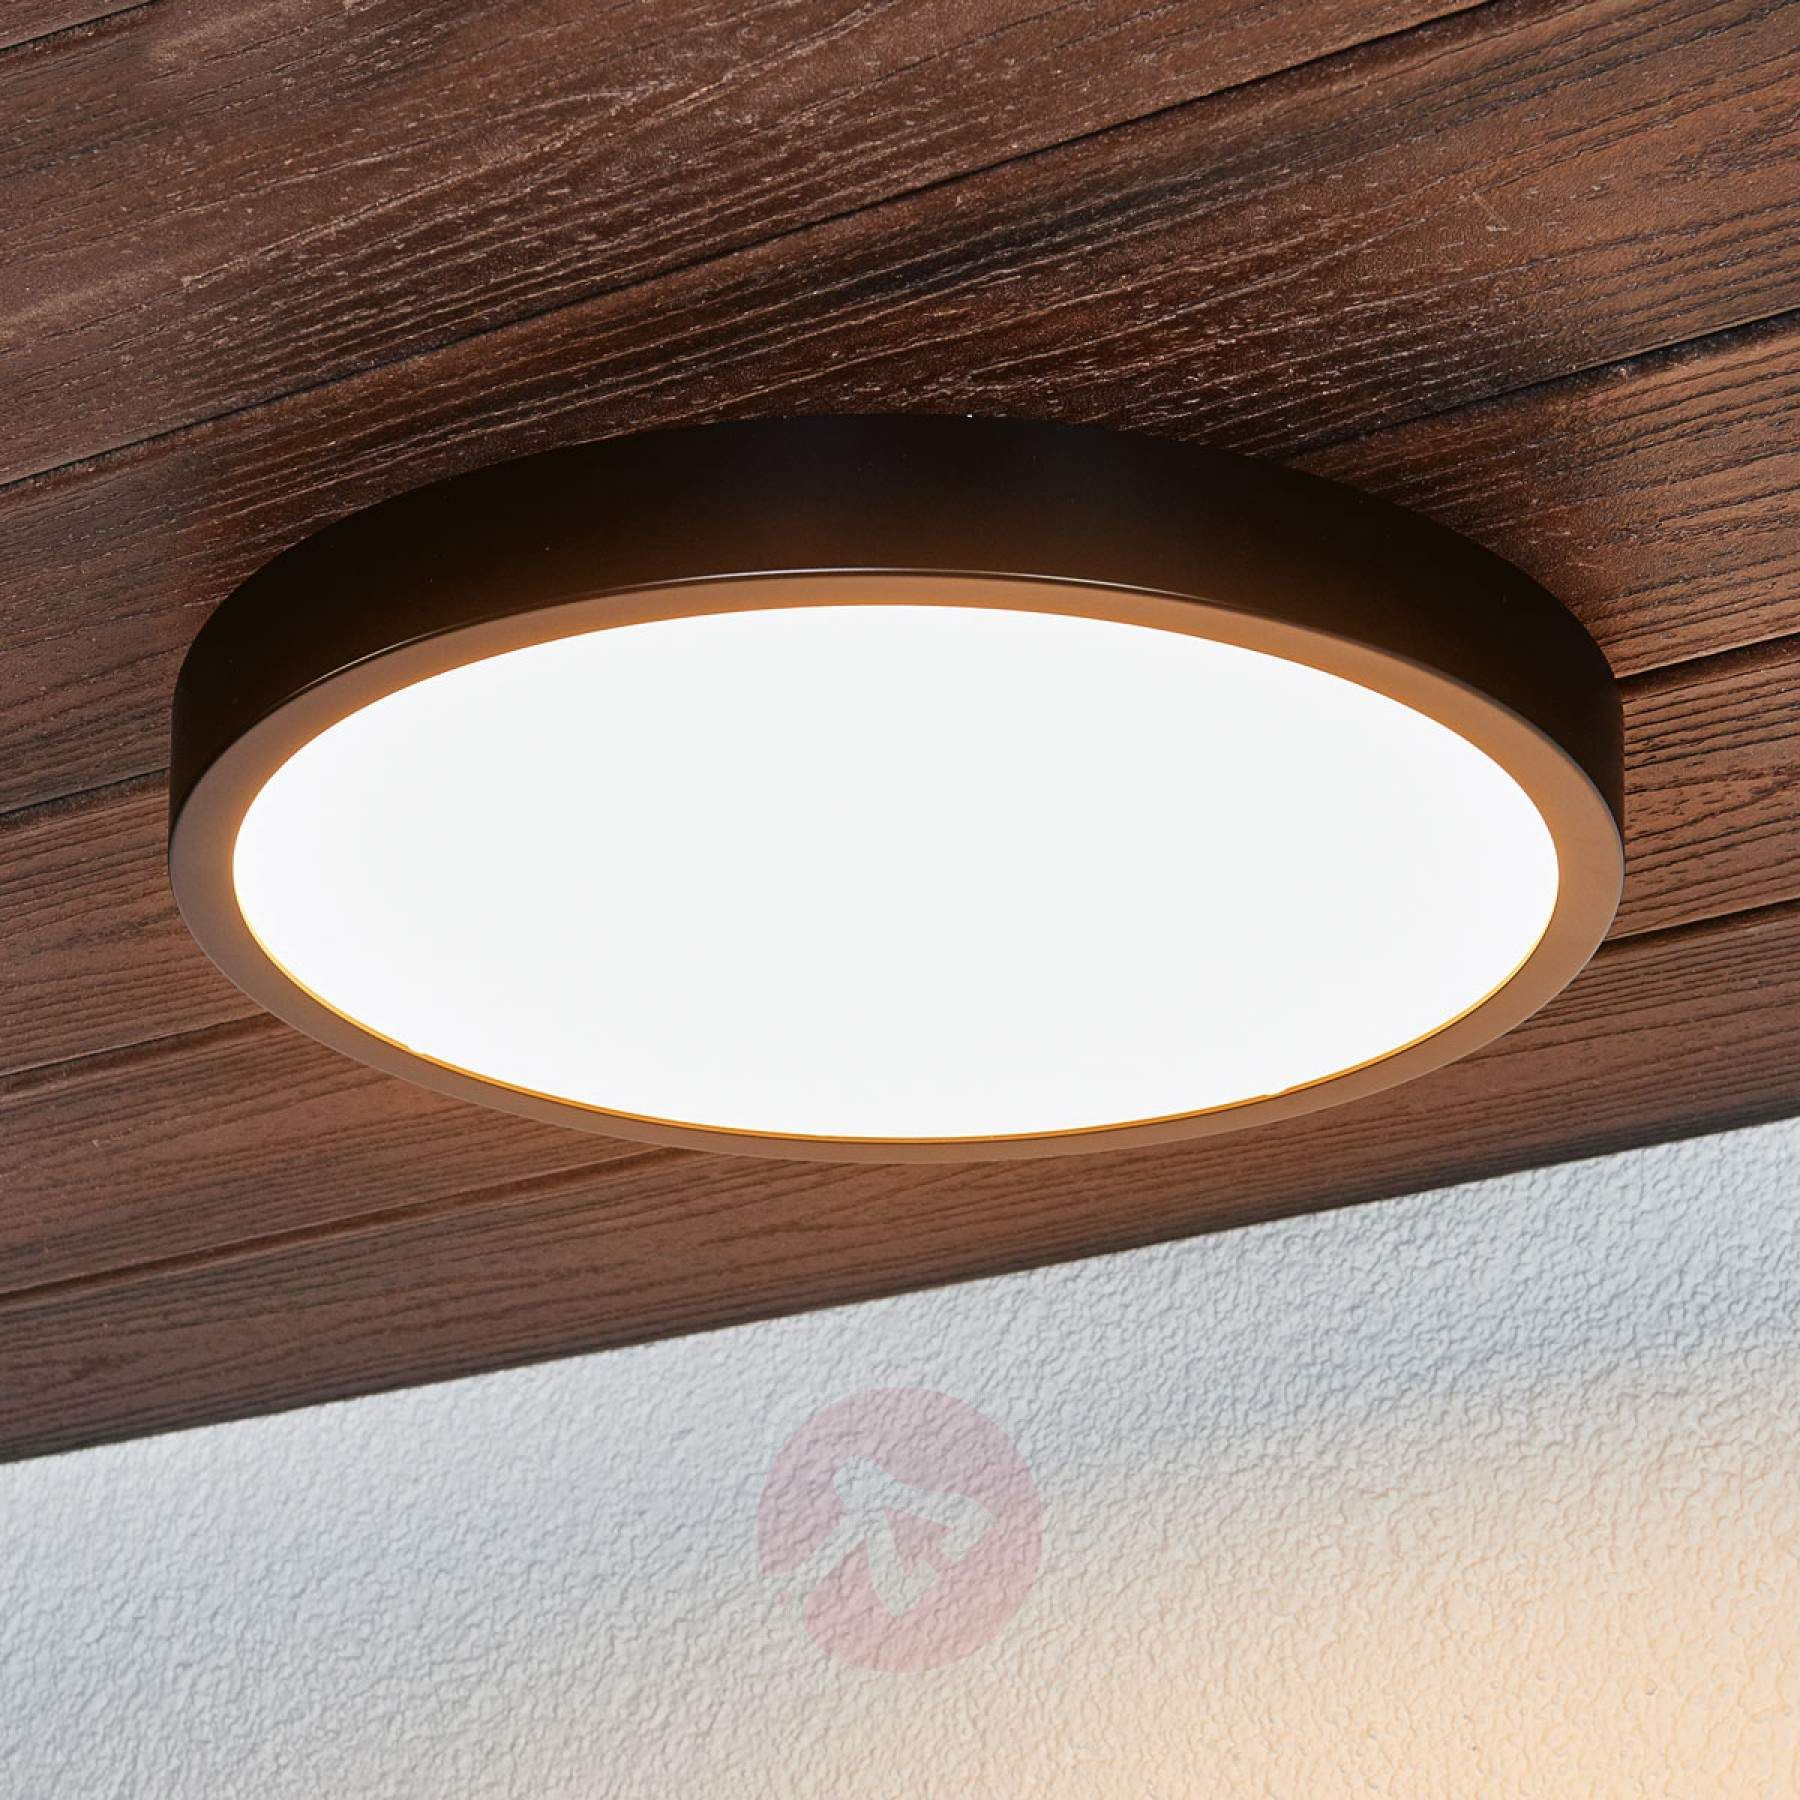 Zwarte Led Plafondlamp Liyan Ip54 Plafondlamp